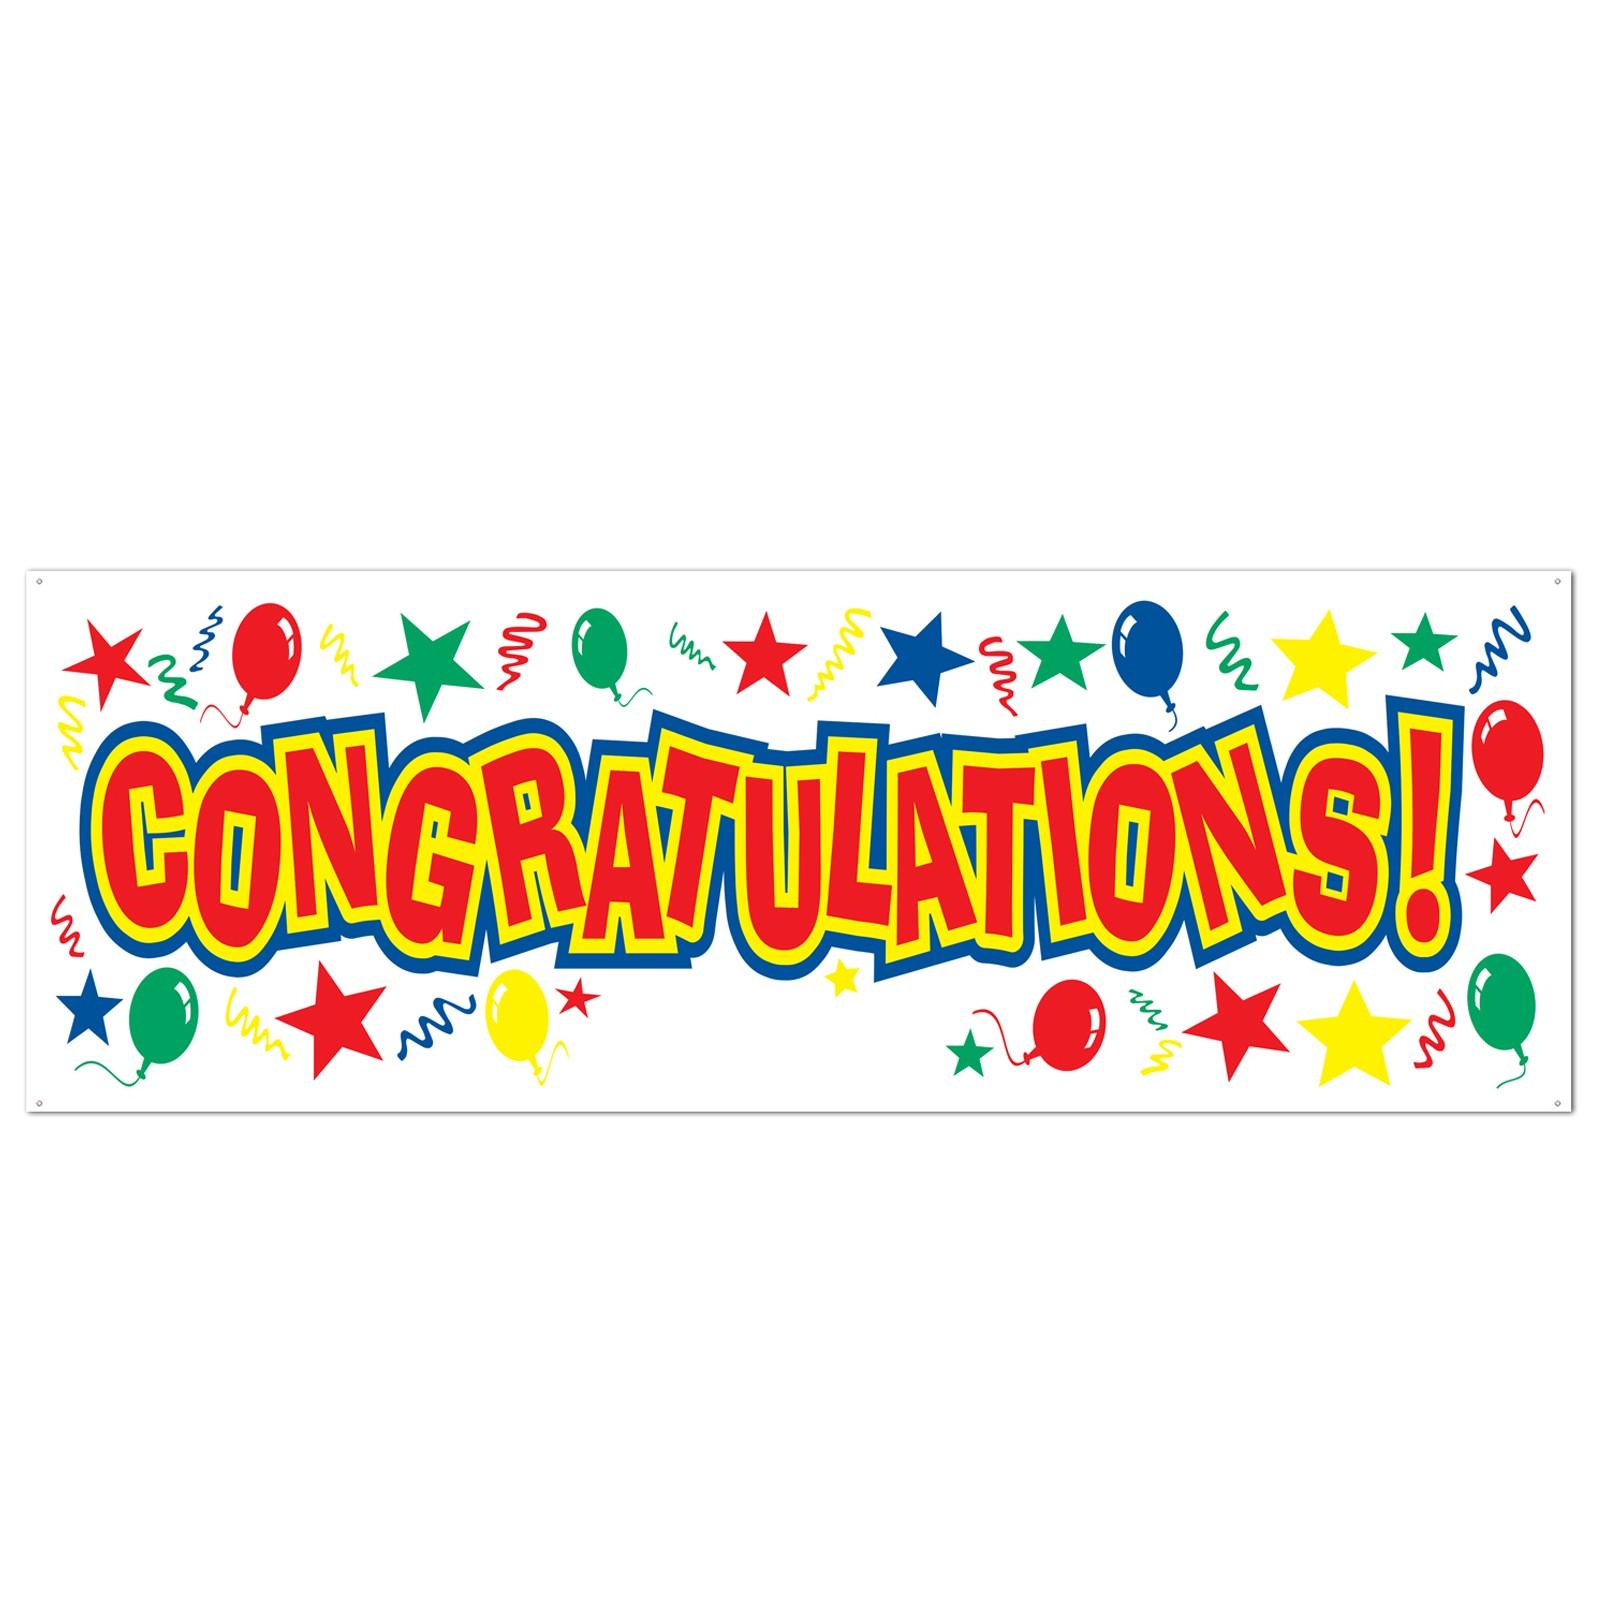 1600x1600 Congratulation Wallpapers, Best Congratulation Wallpapers In High